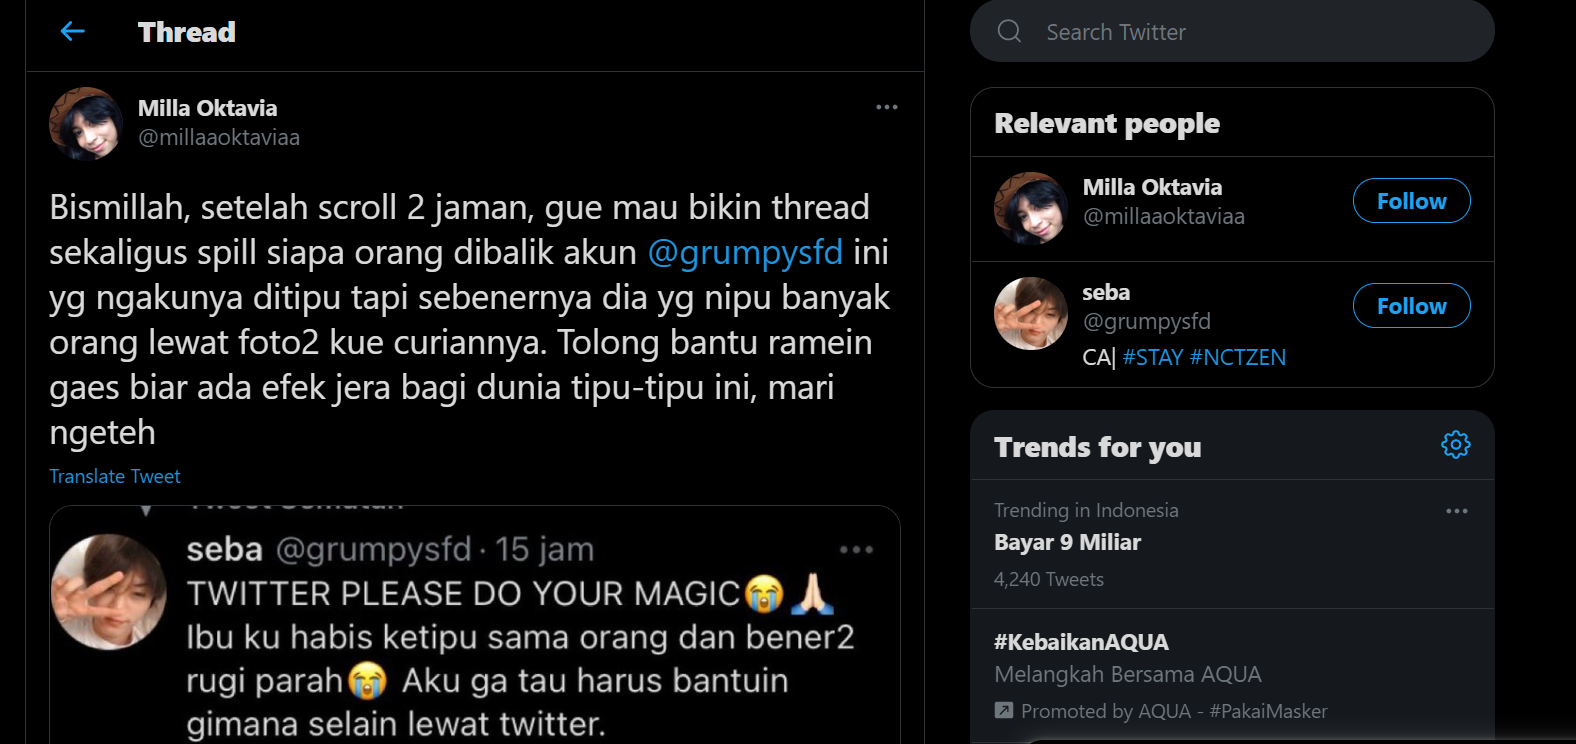 Penipuan Berkedok Twitter Please Do Your Magic Terbongkar Oleh Netizen, Bagaimana Ceritanya?